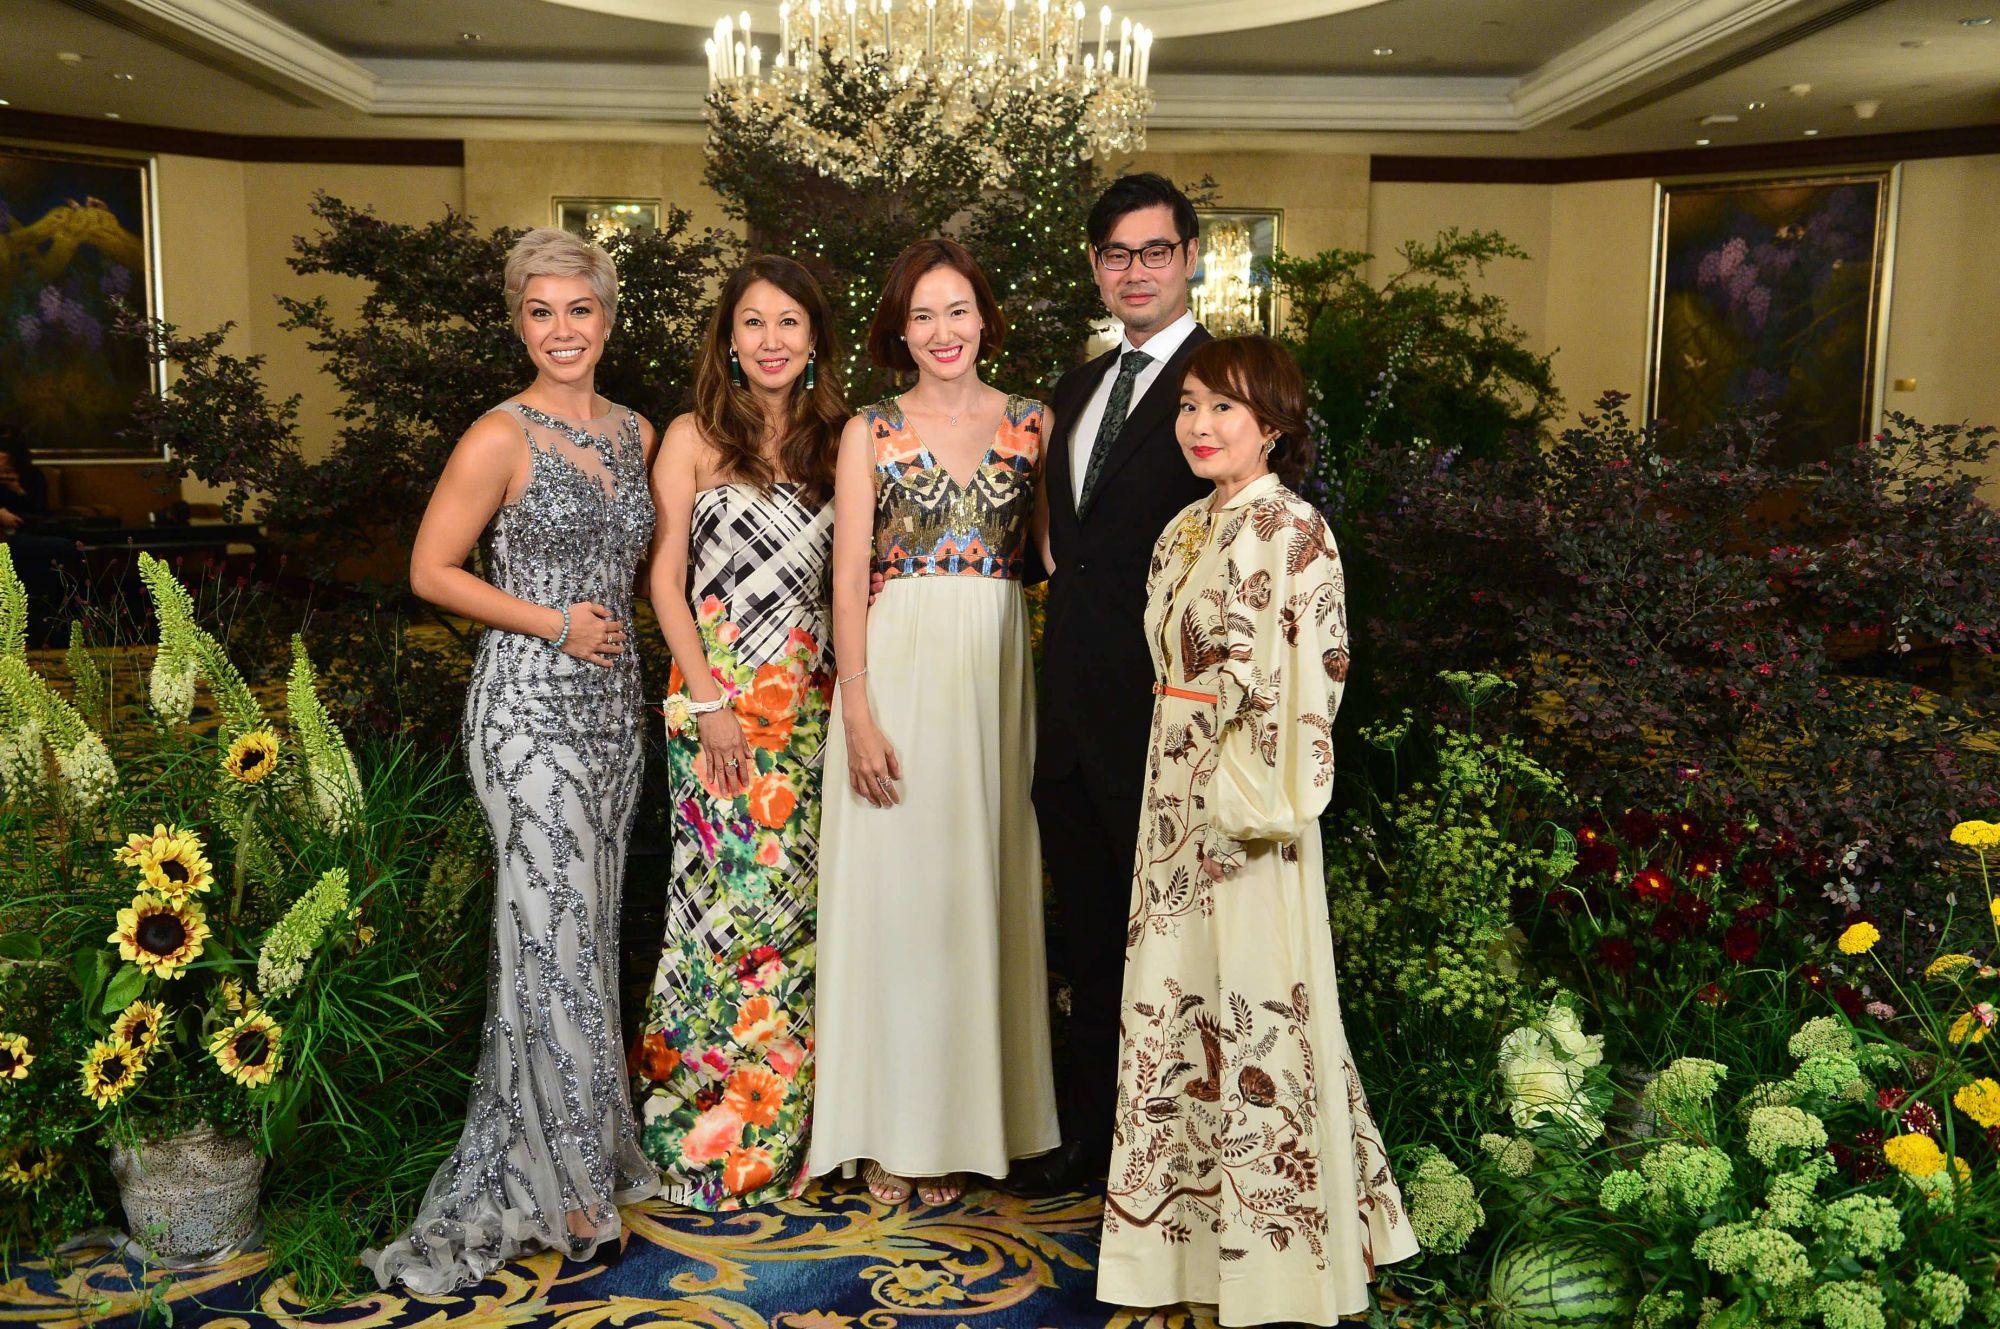 Nikki Muller, June Goh-Rin, Elly Lam, Johnny Lam, Joy Tan